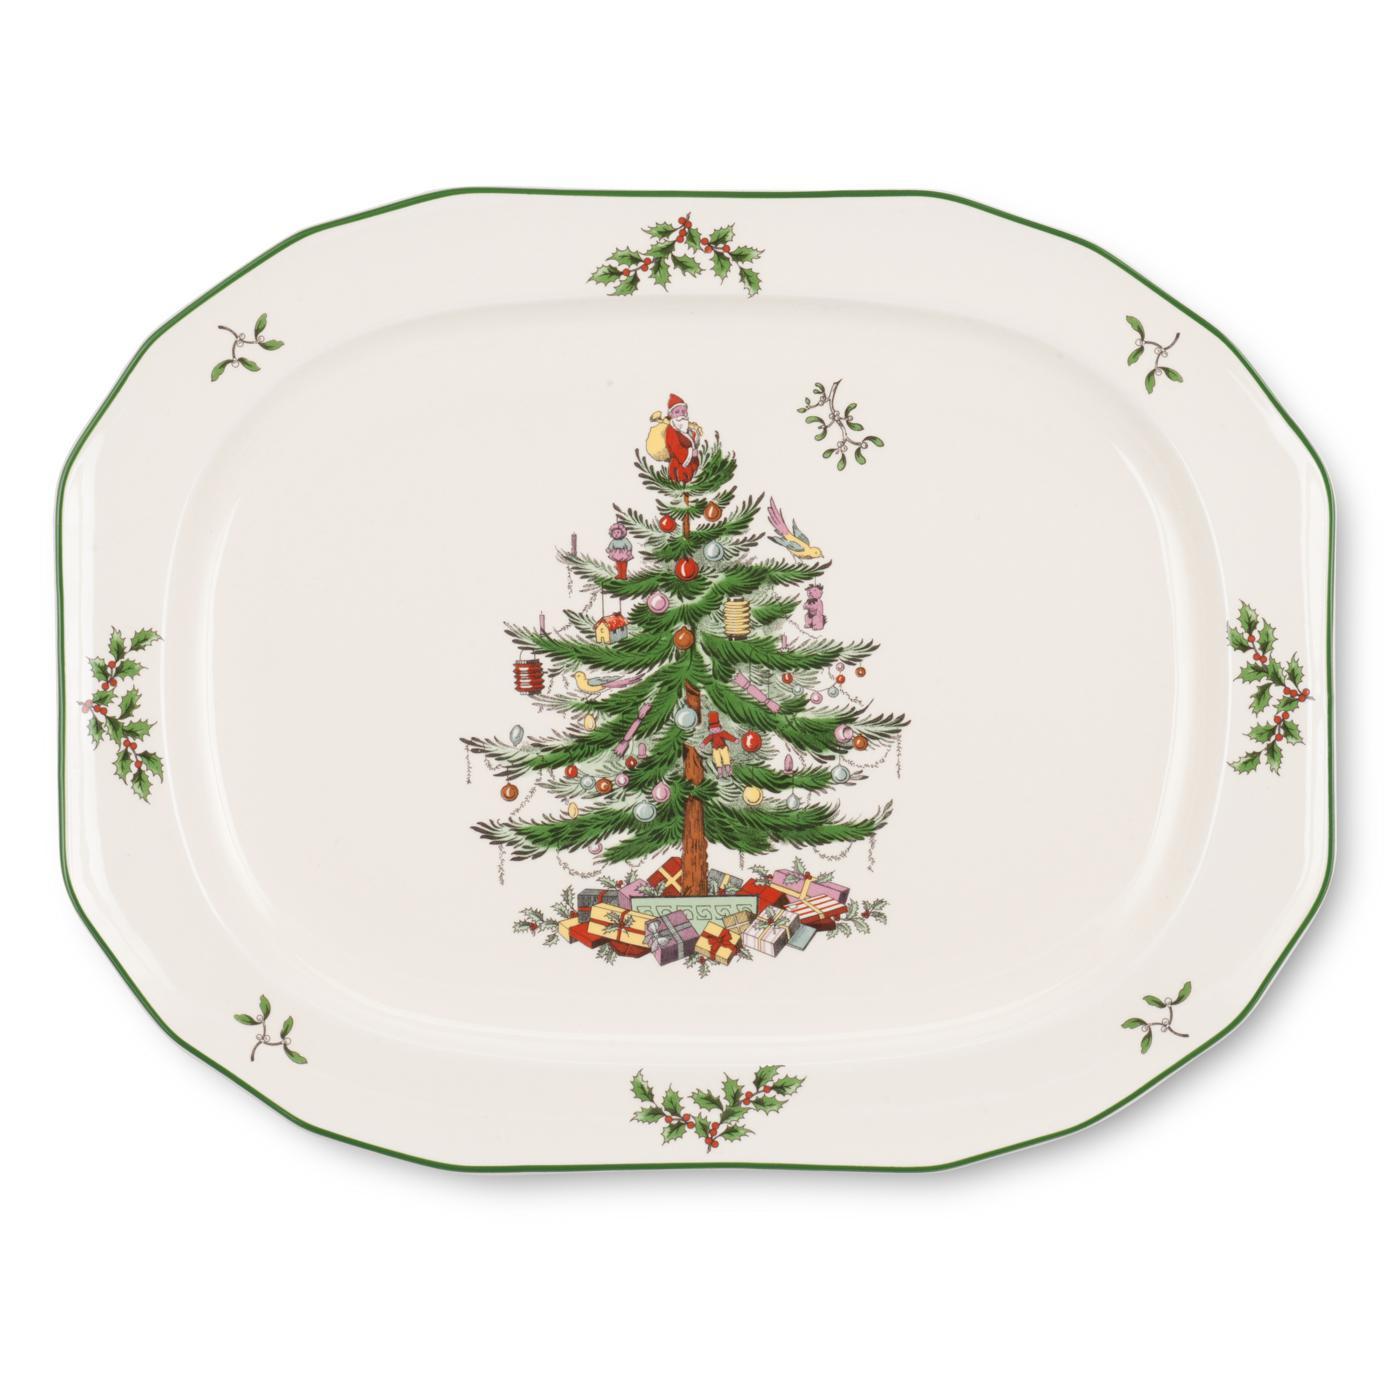 Spode Christmas Tree Sculpted Oval Platter image number 0